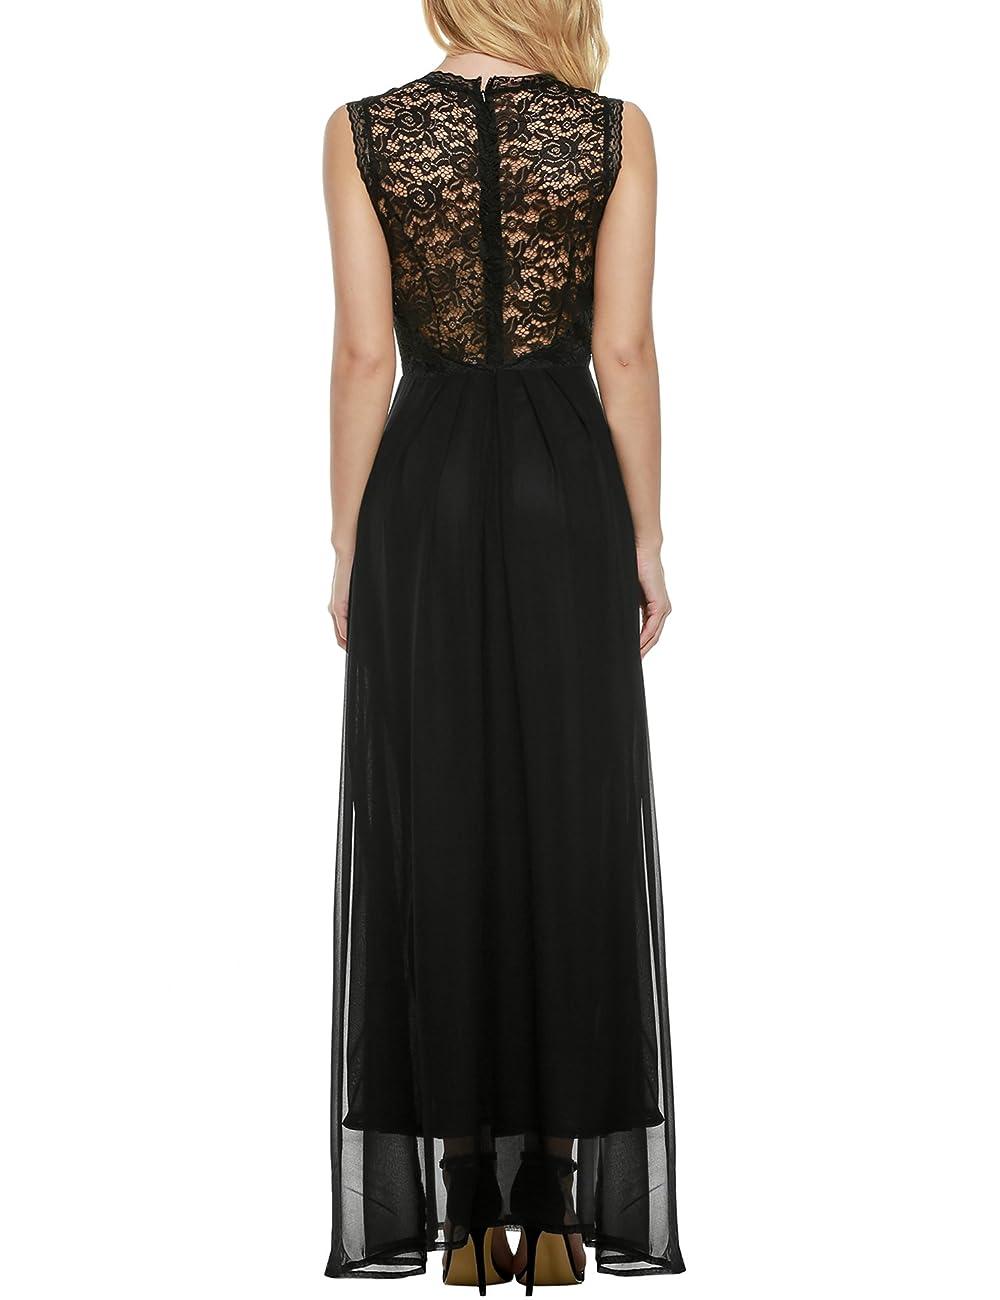 ANGVNS Women's Casual Deep- V Neck Sleeveless Vintage Maxi Dress 2